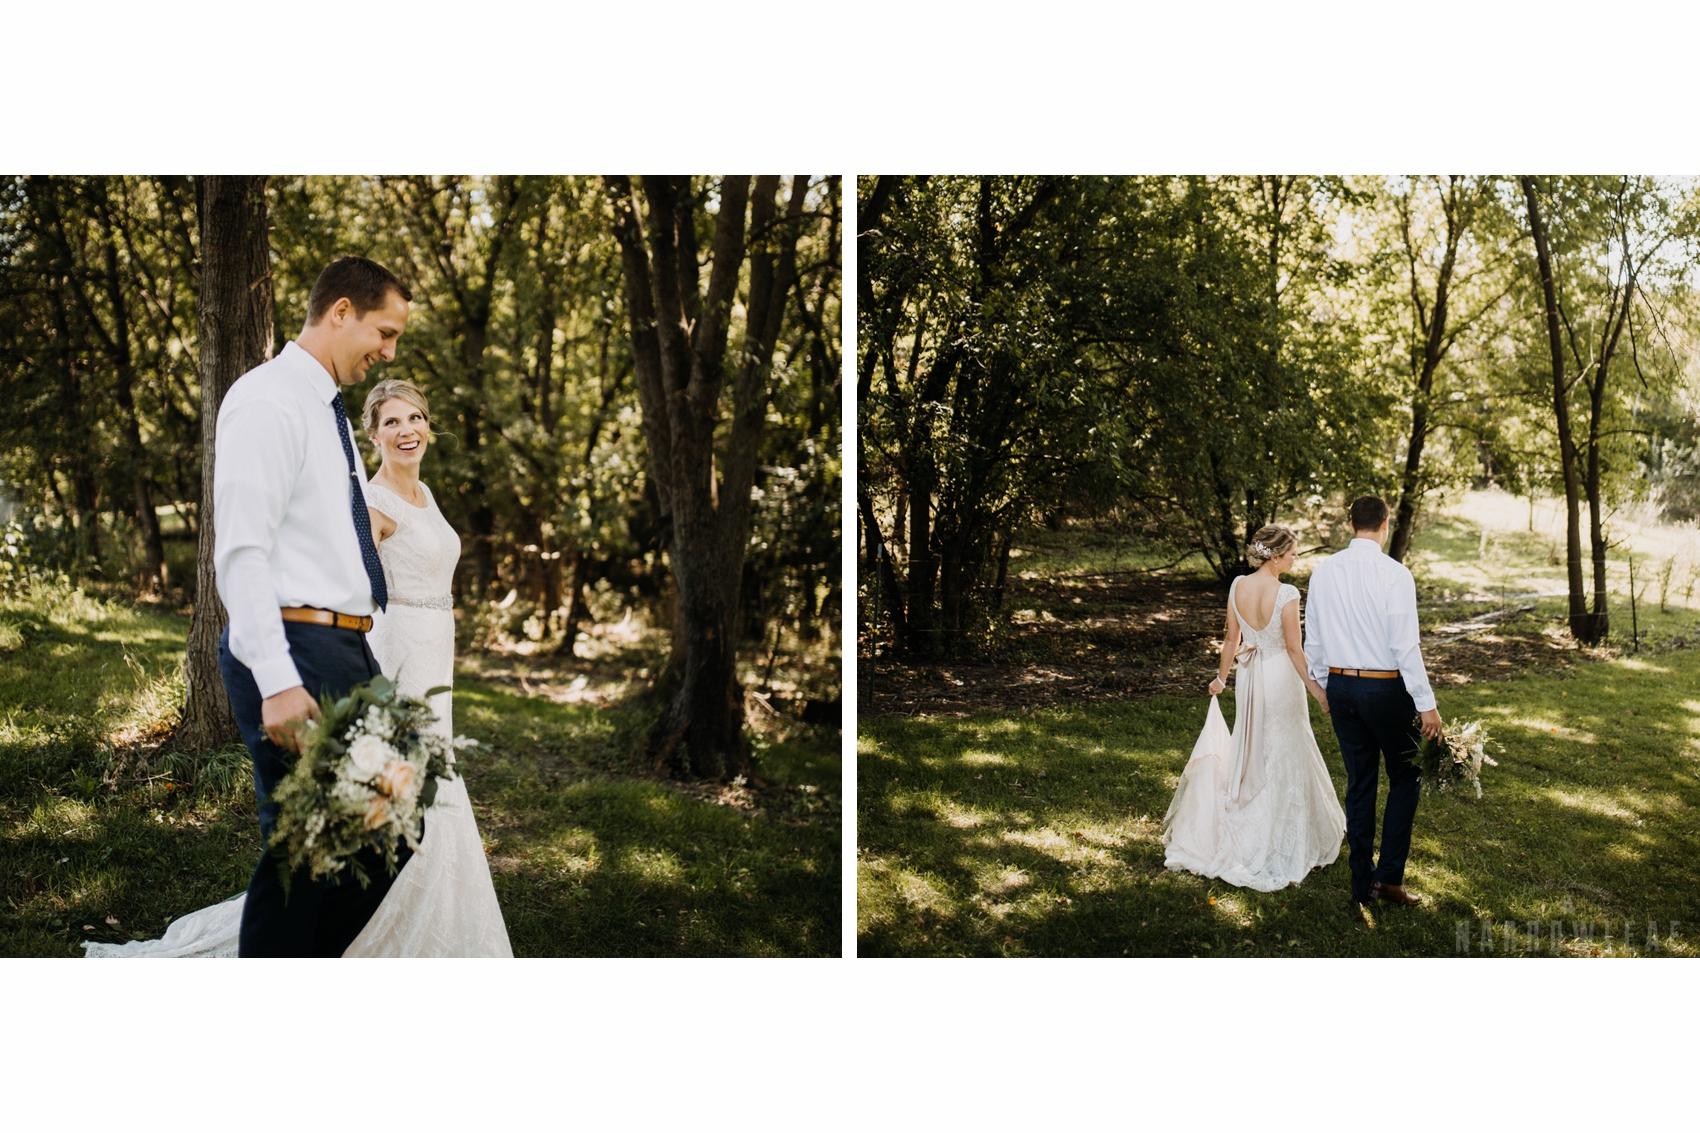 farm-wedding-bride-groom-photos-in-south-haven-mn-015-016.jpg